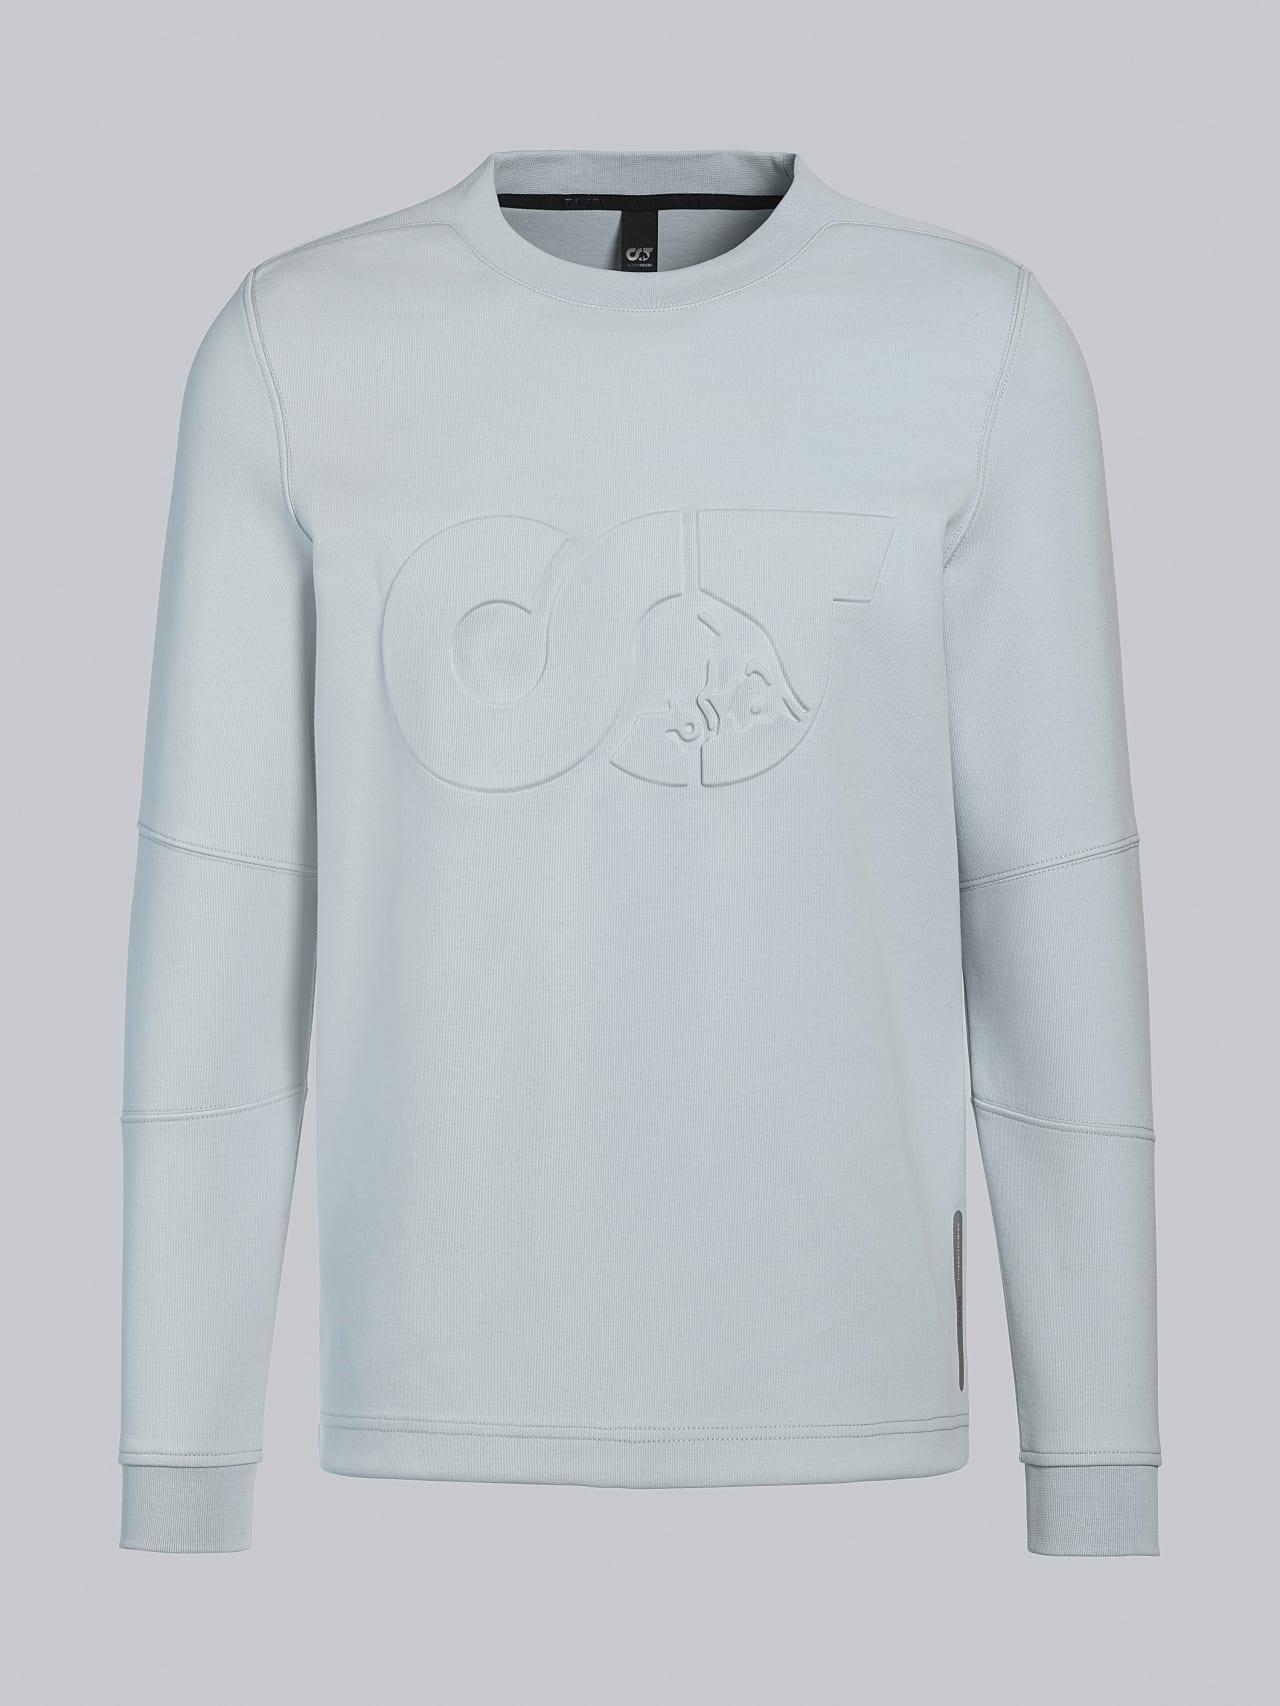 SCONA V1.Y5.02 Premium Sweatshirt Blass Blau Hinten Alpha Tauri